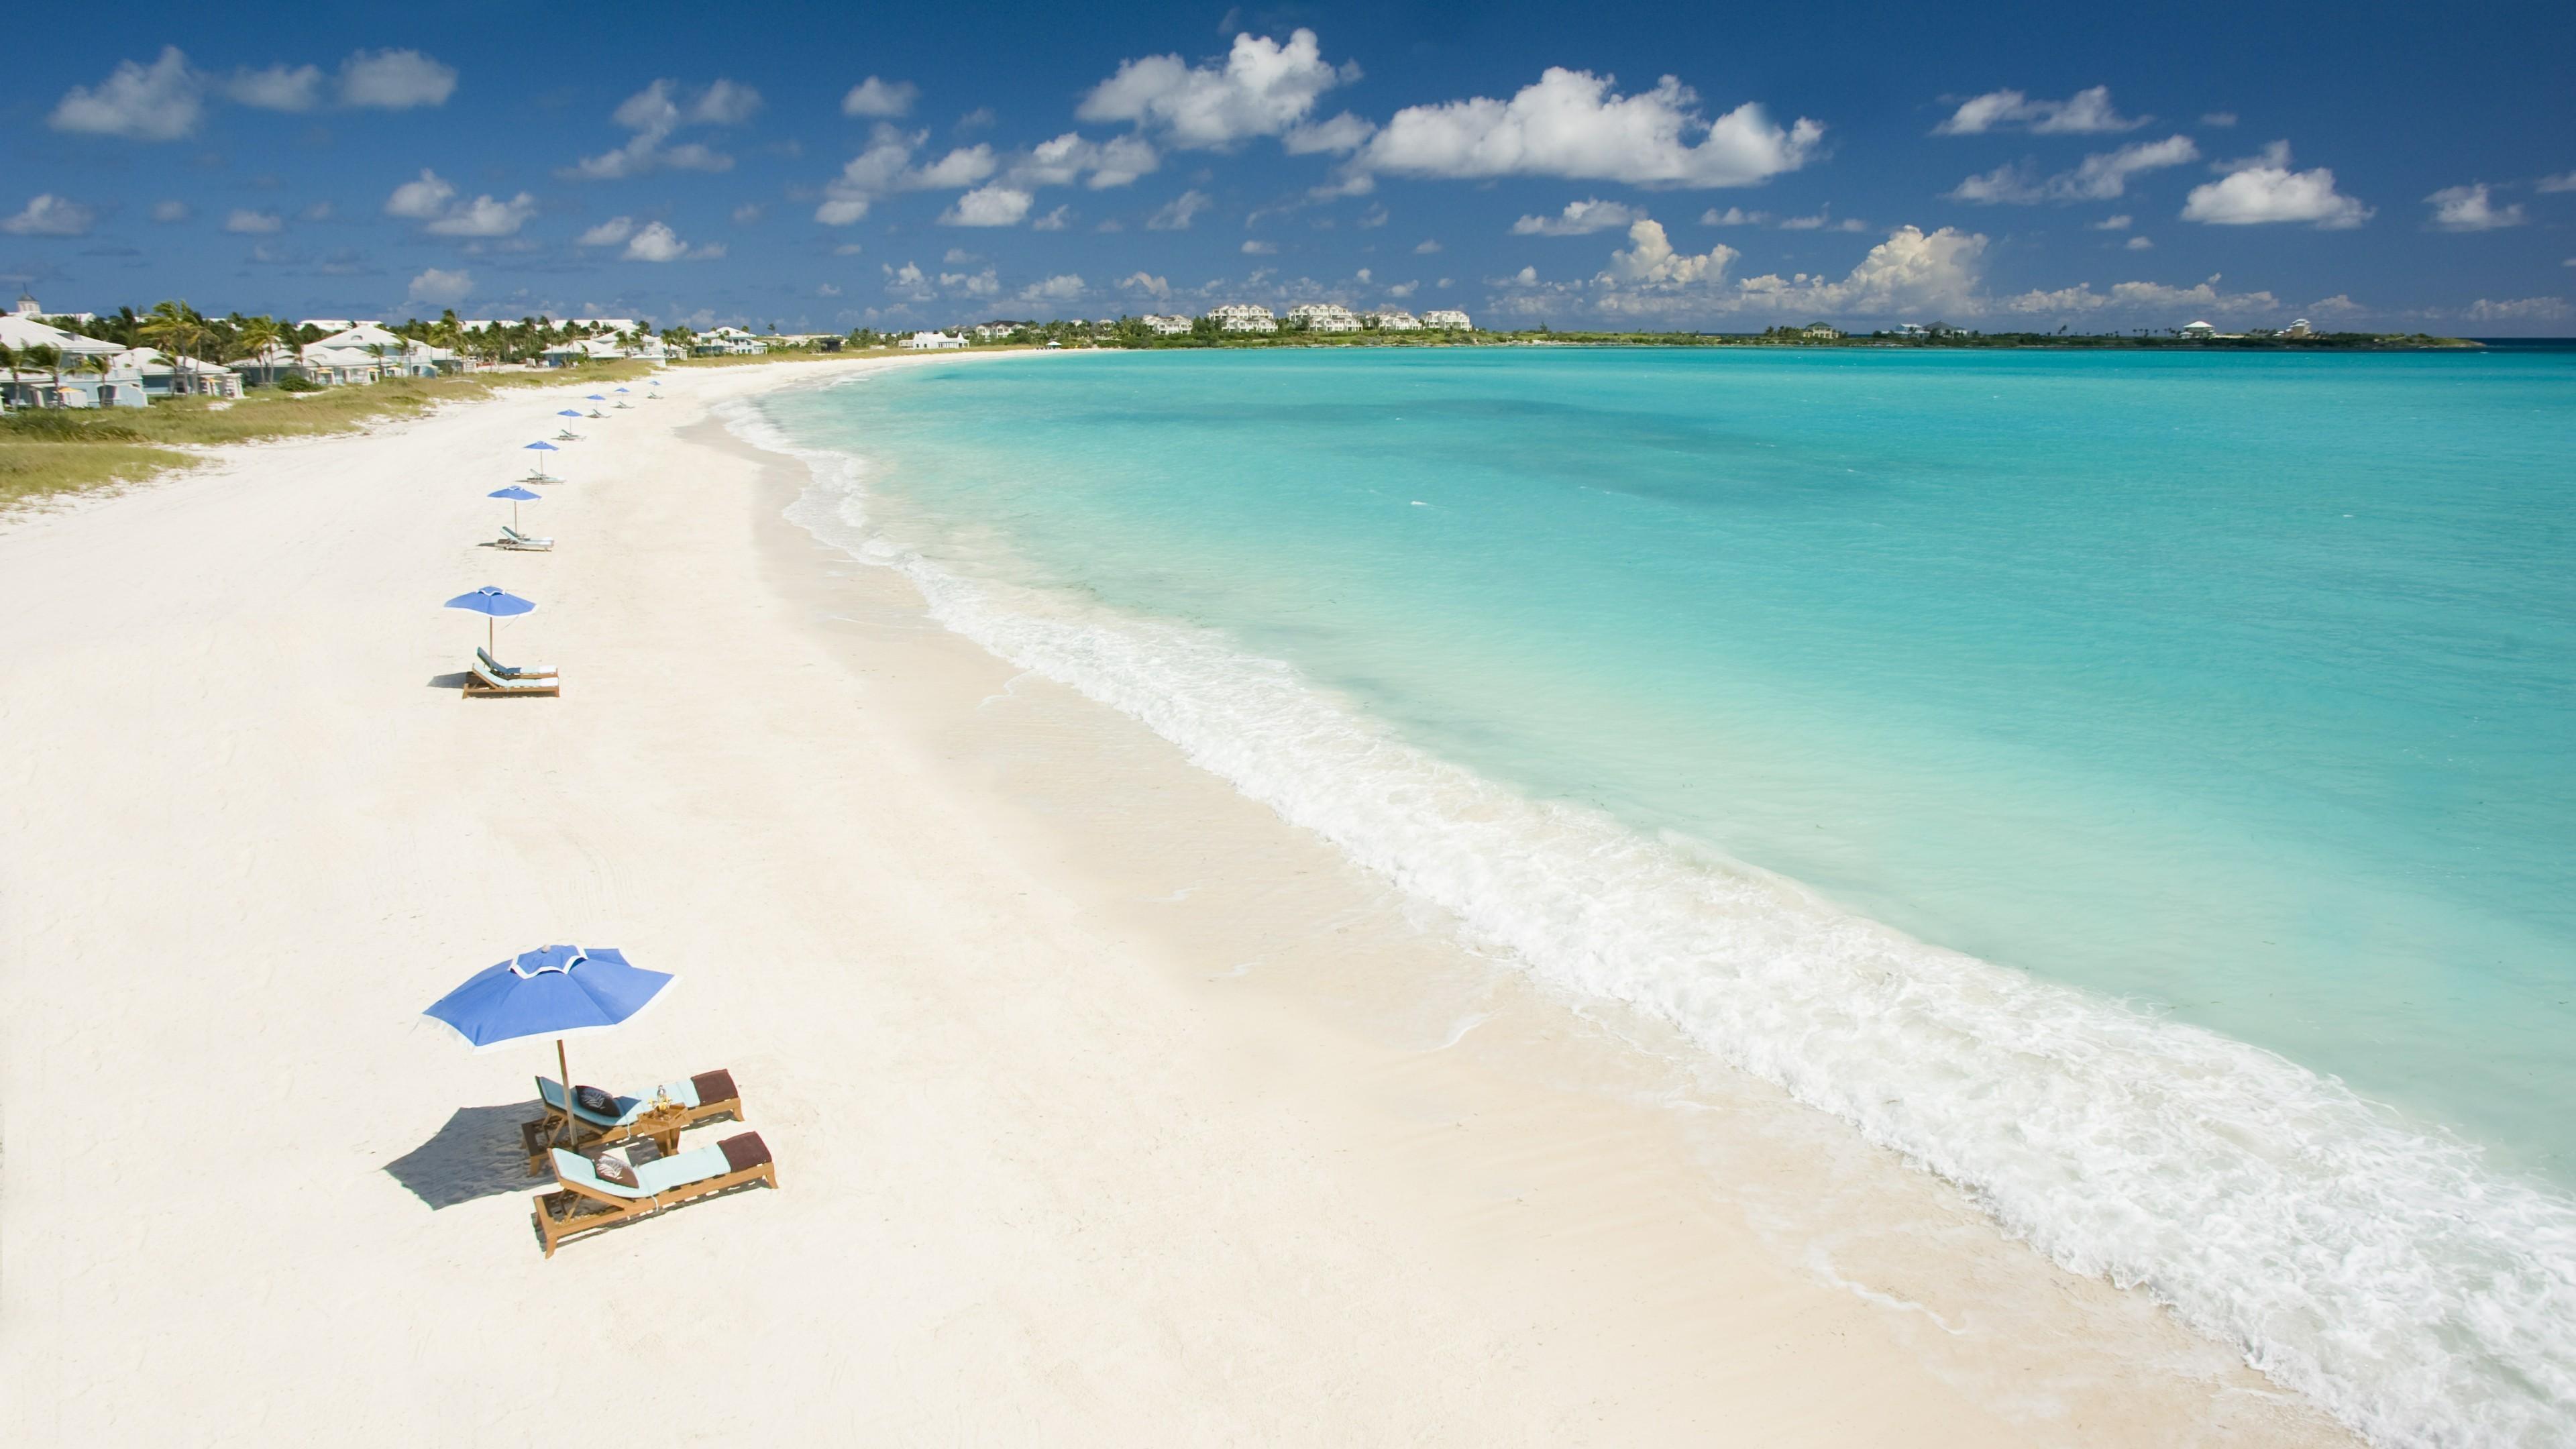 Bahamas Wallpapers 54 Images